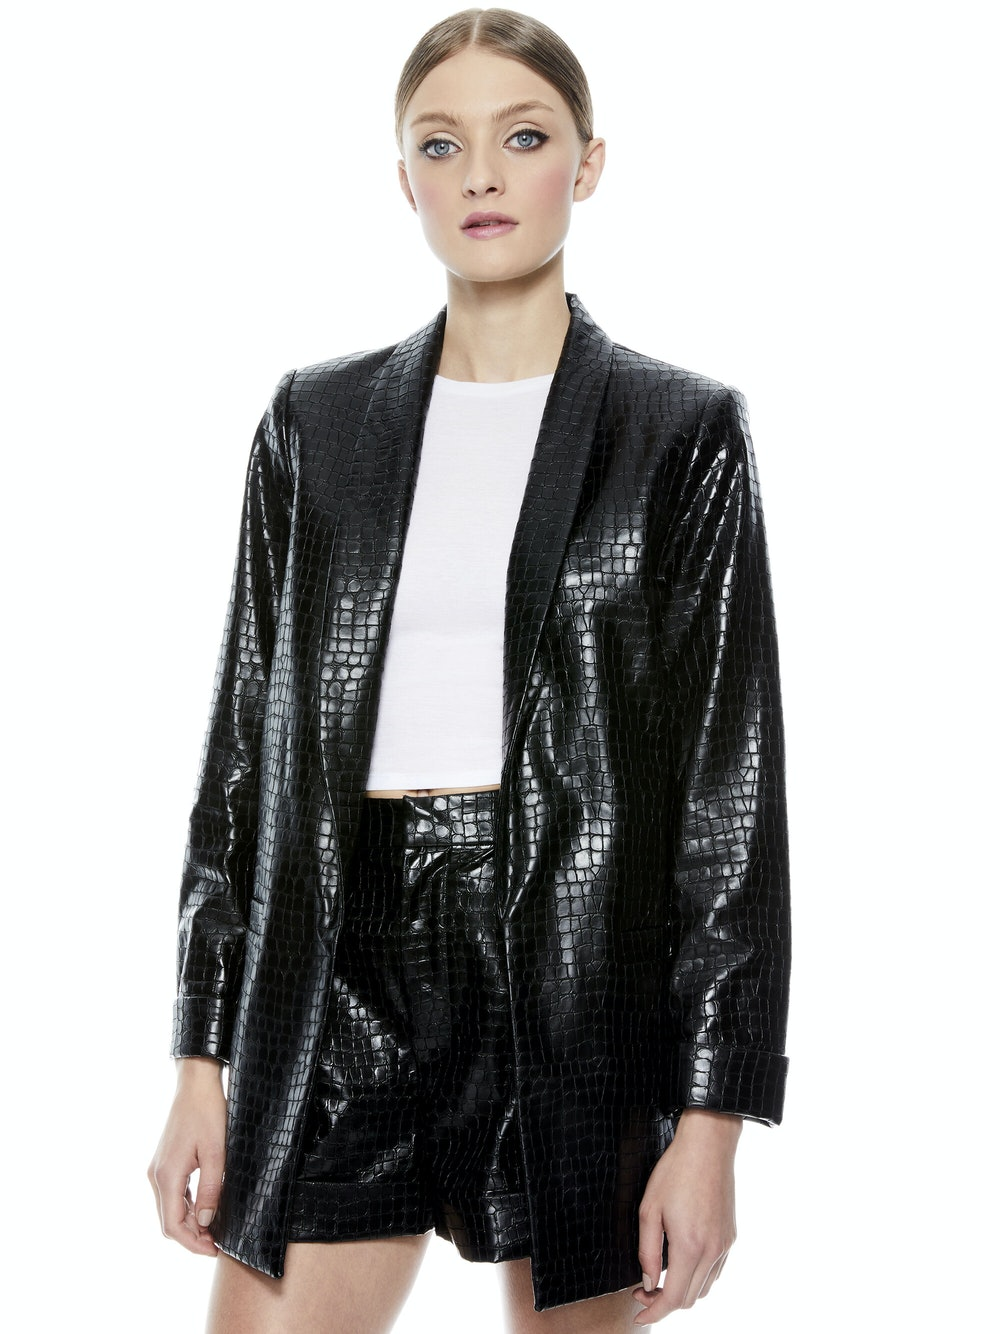 Kylie Vegan Leather Jacket